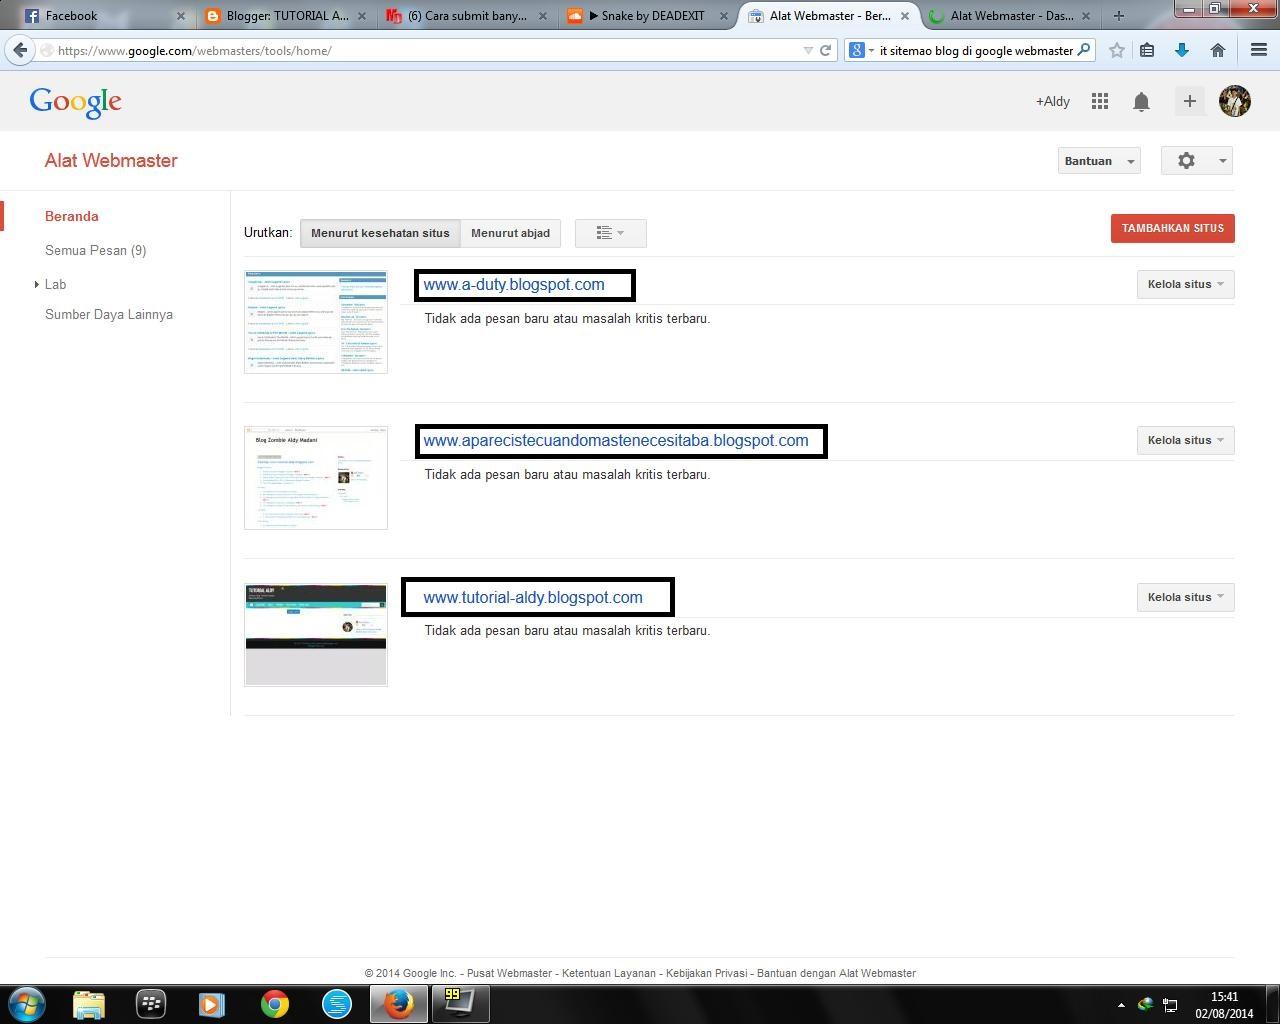 Cara Mensubmit Banyak Sitemap Blog Ke Google Webmaster Tools